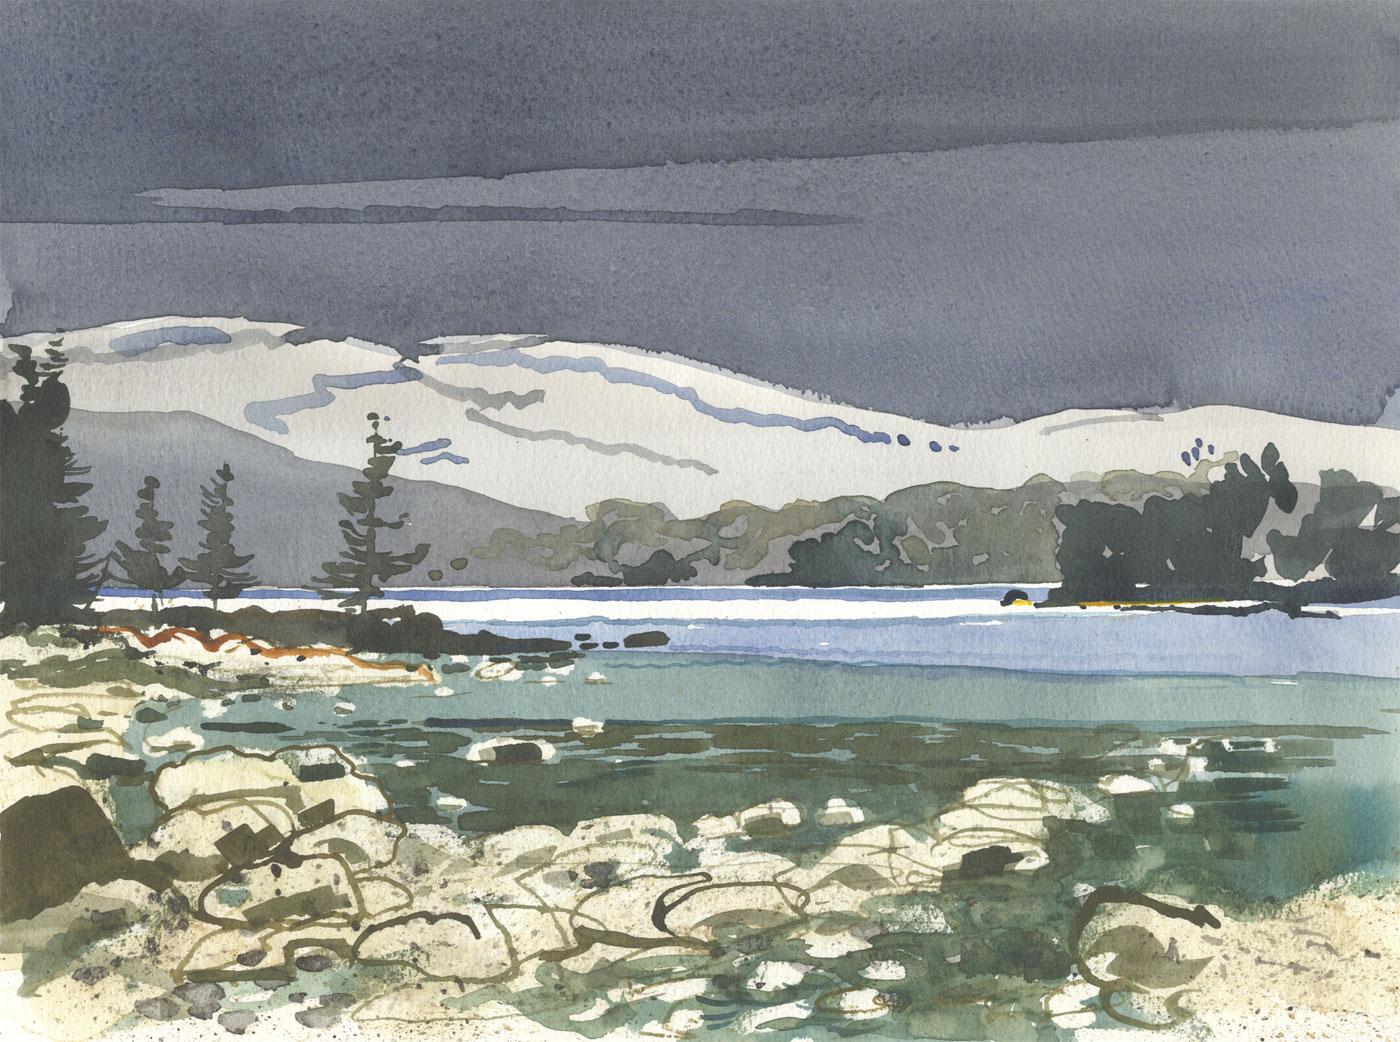 Robert T. Blayney (1929-2016) - Mid 20th Century Watercolour, Lake Landscape